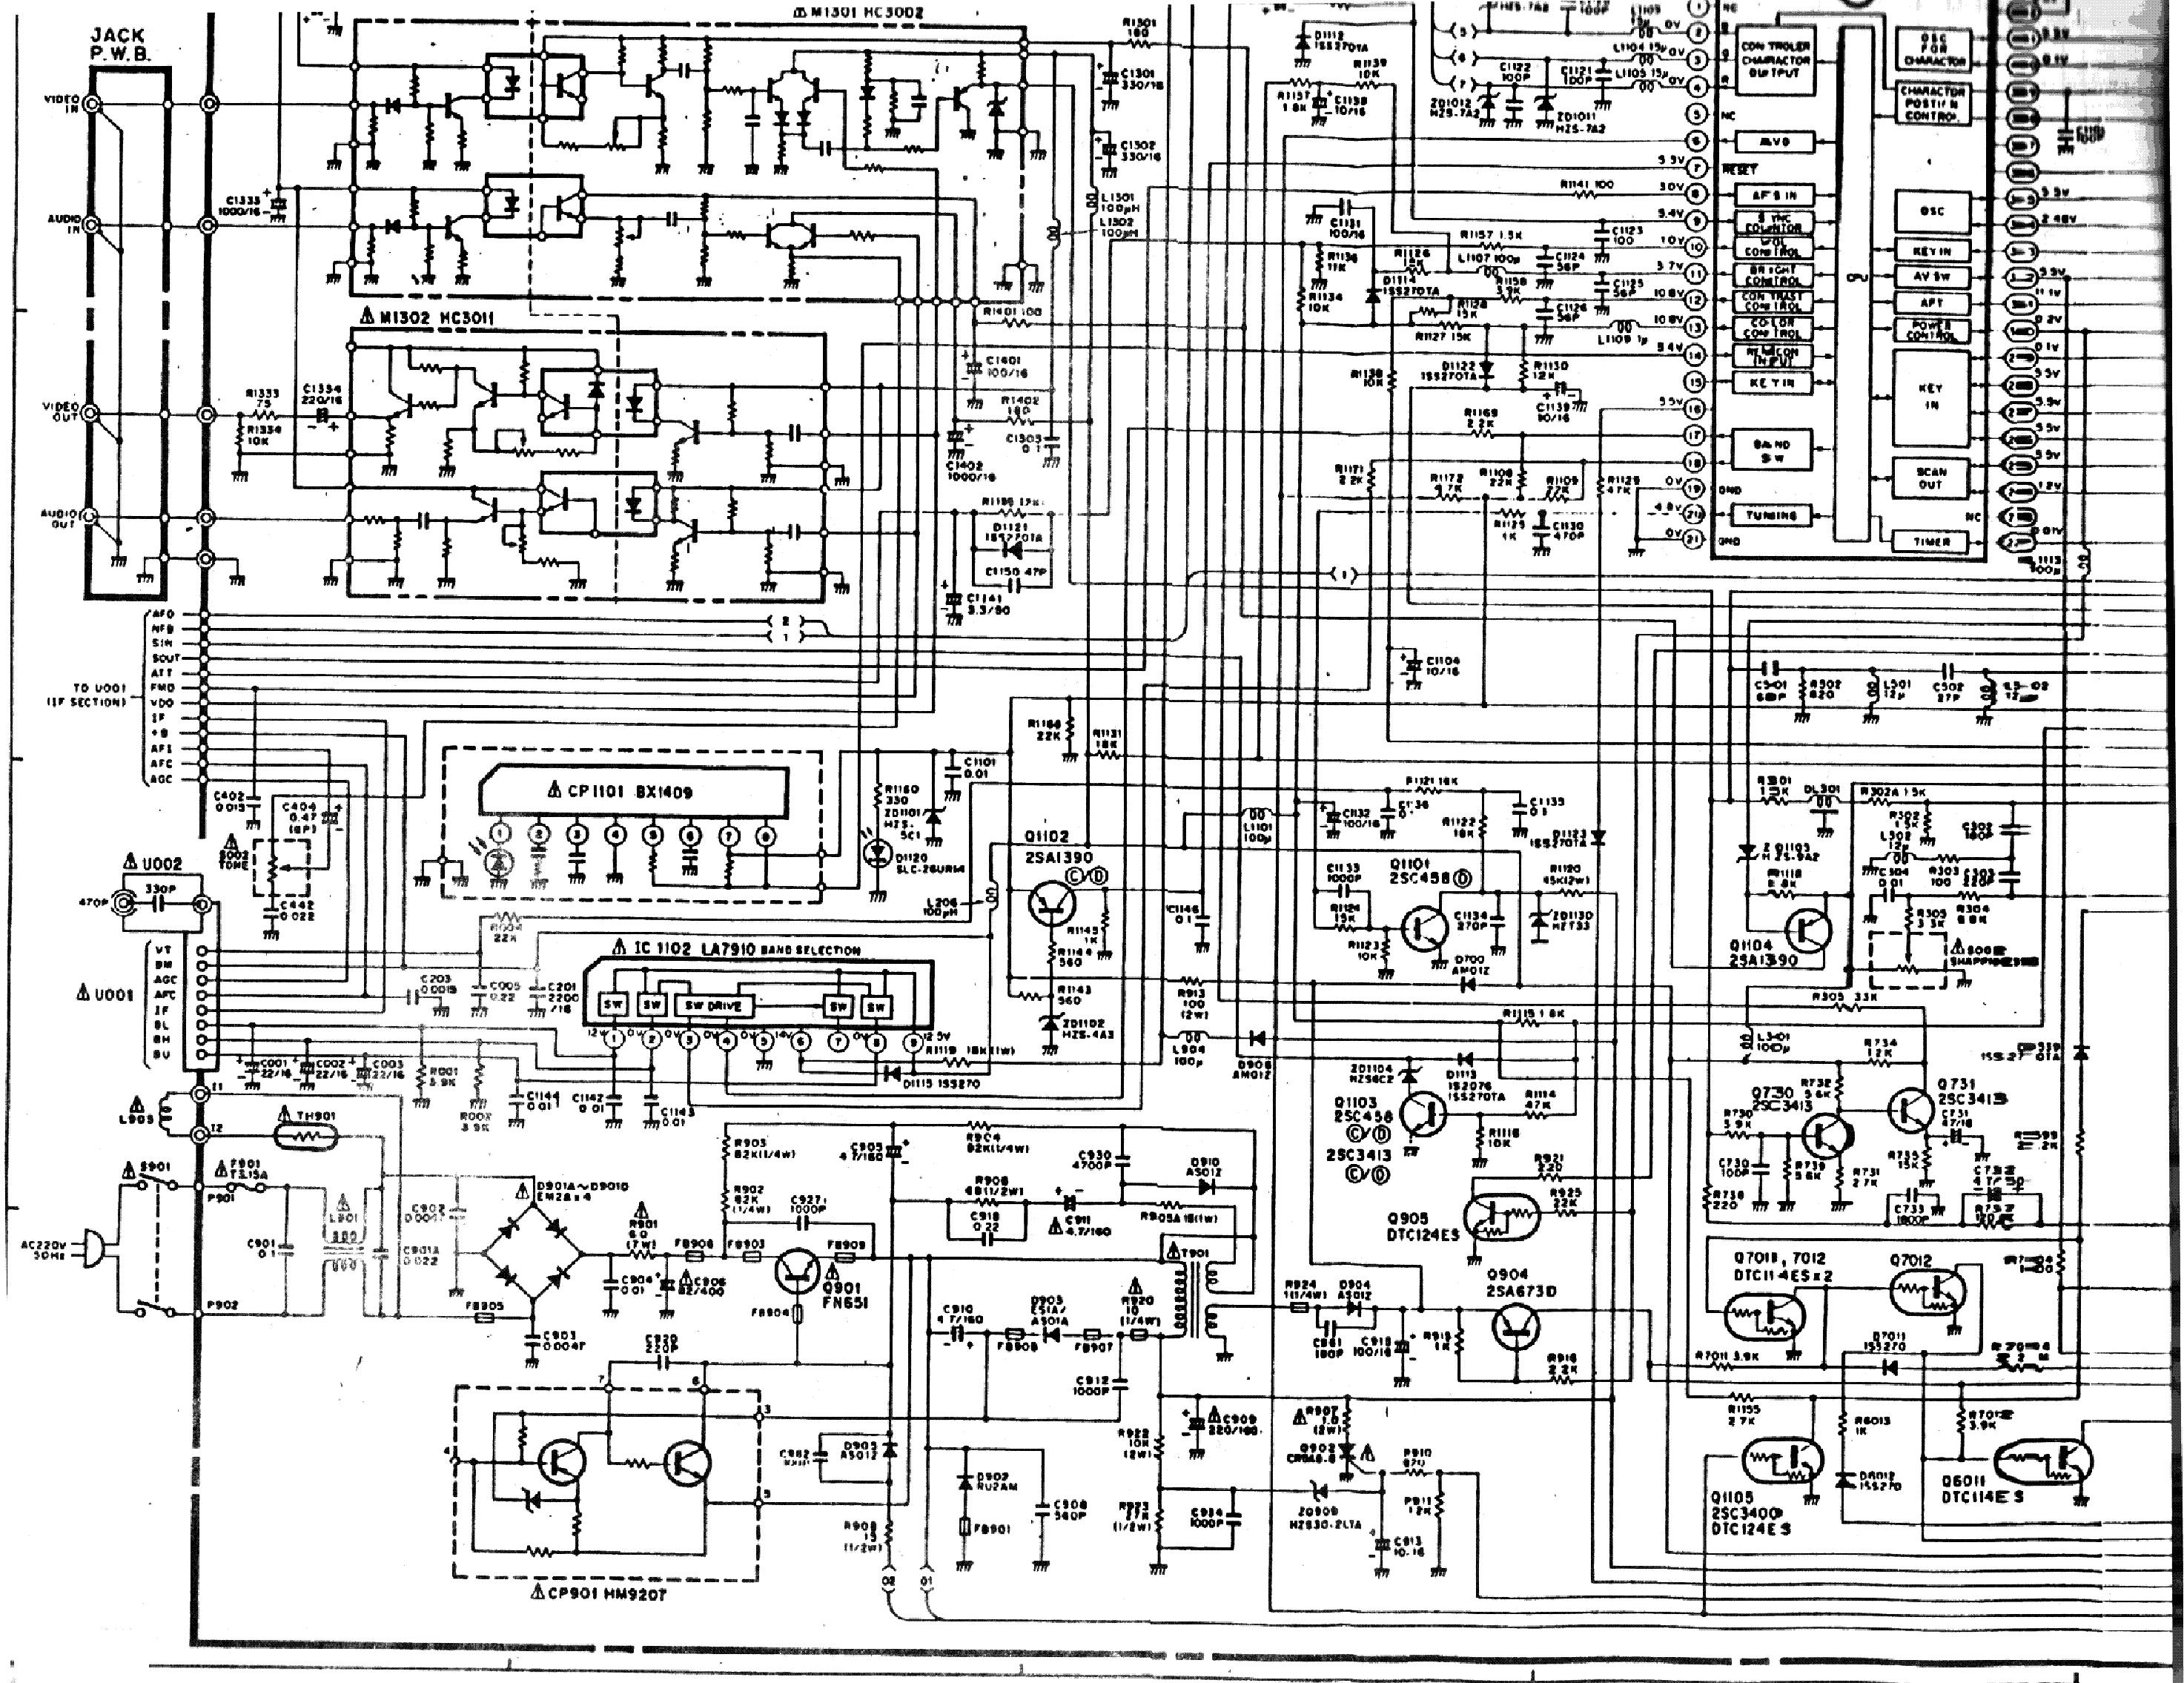 circuit diagram hitachi tv auto electrical wiring diagram u2022 rh 6weeks co uk